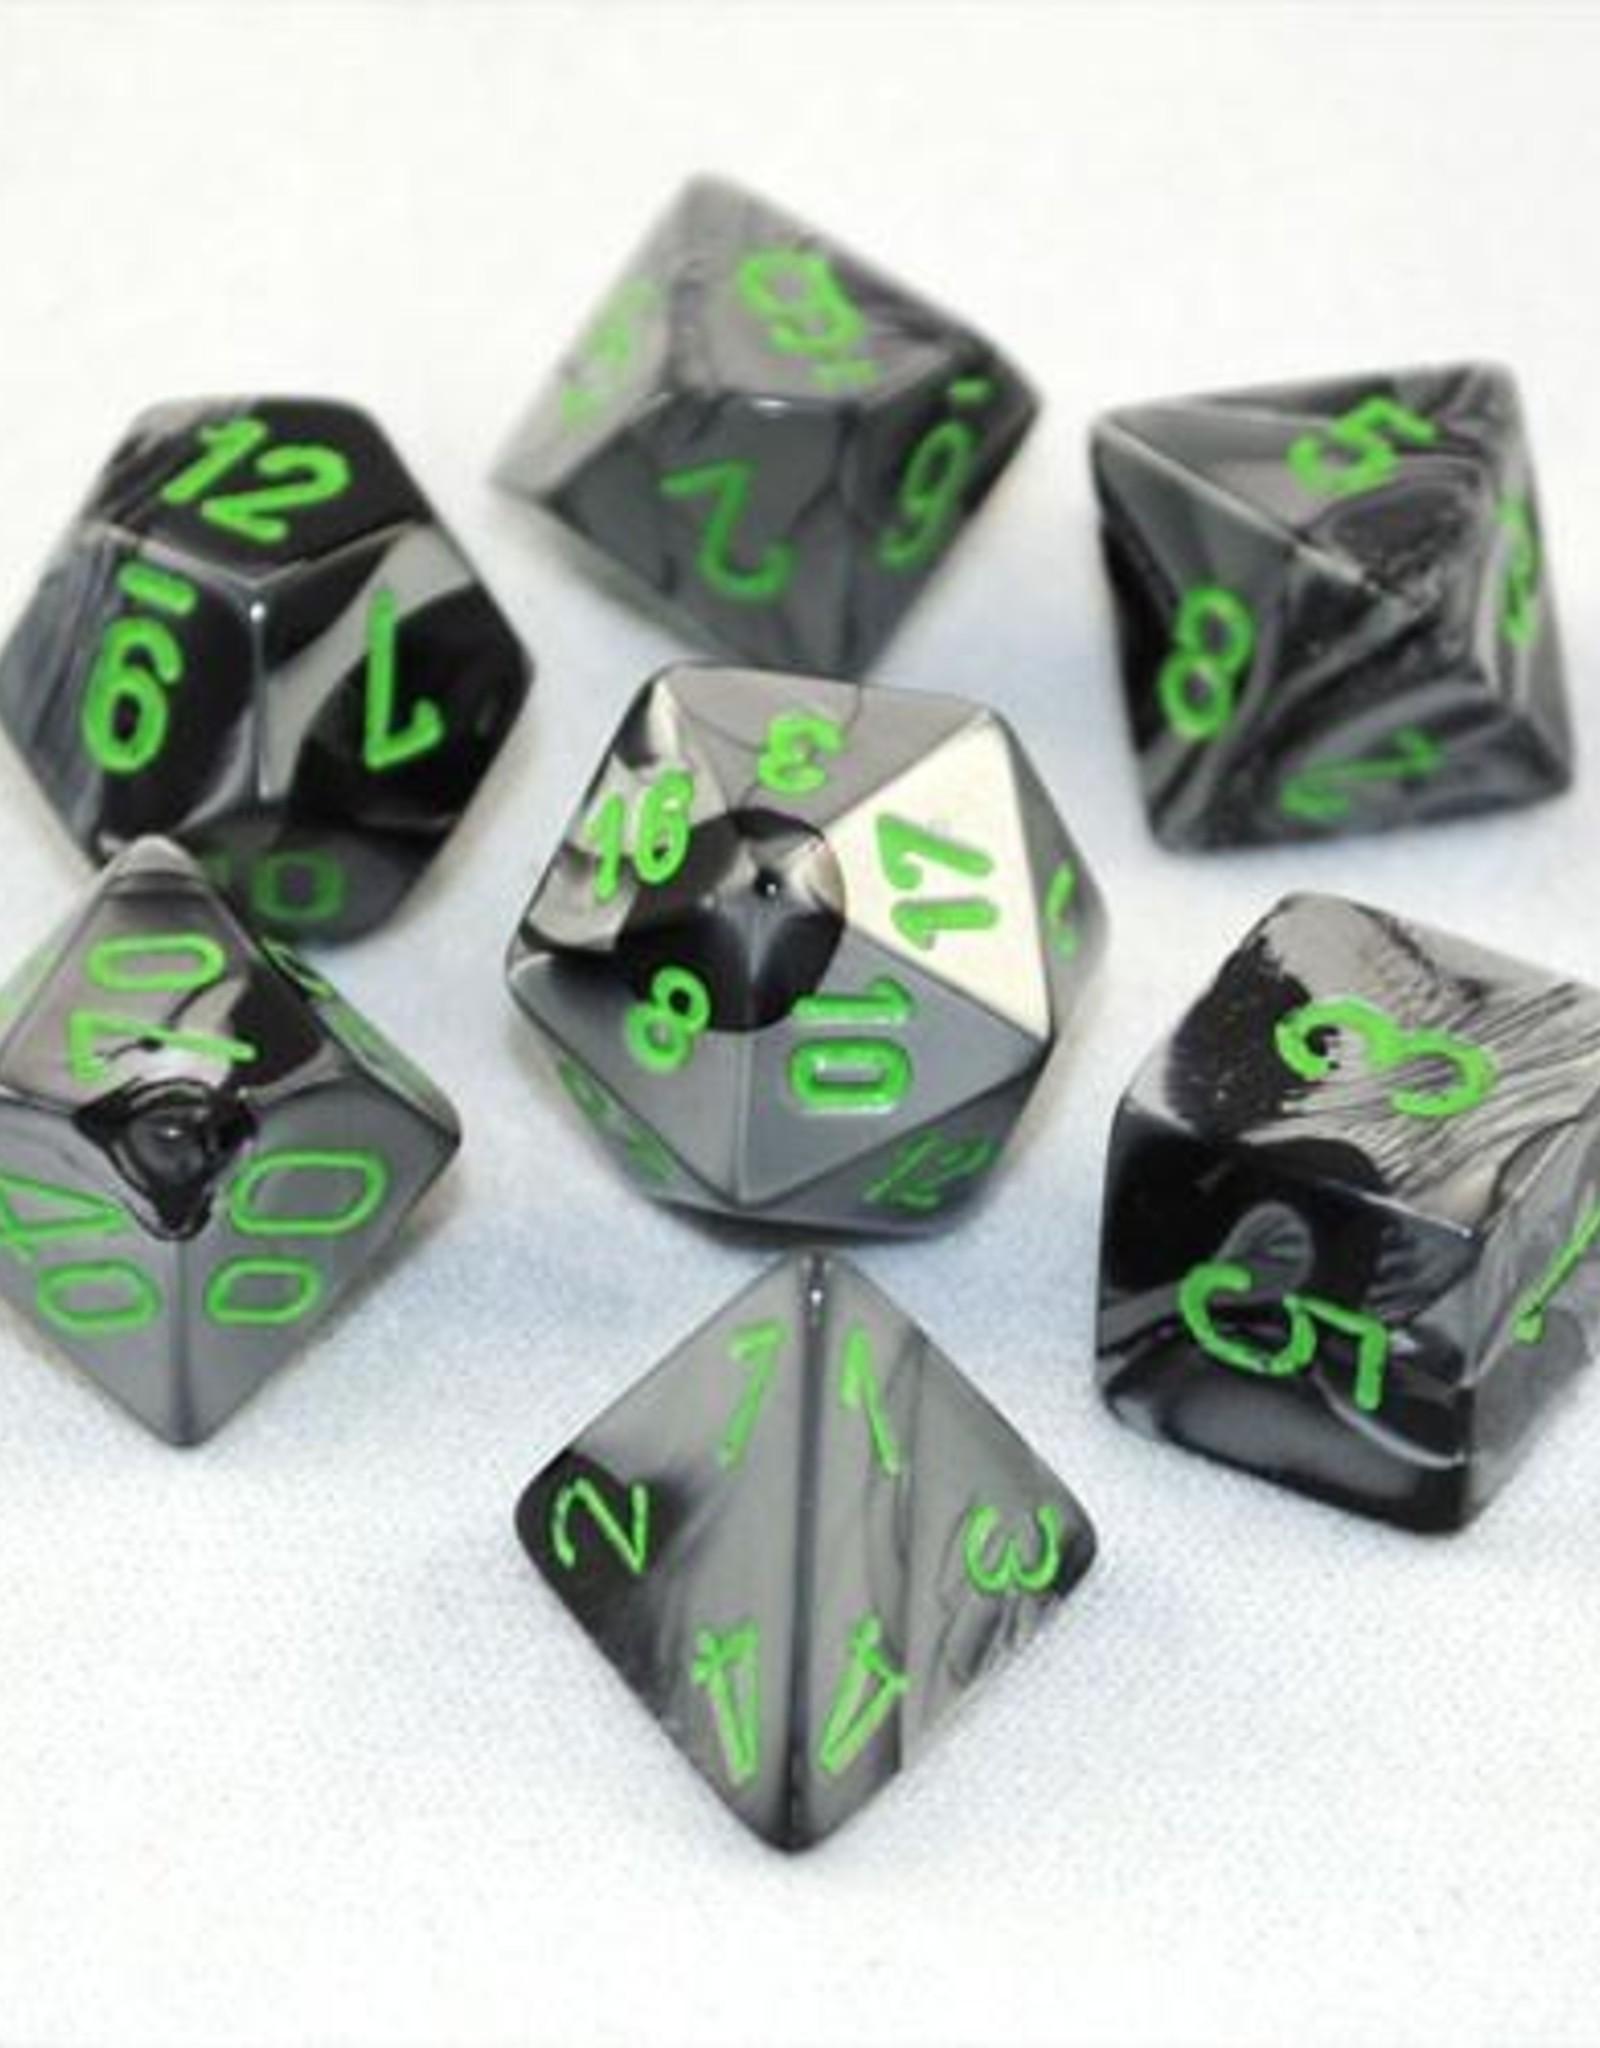 Chessex Chessex 7-Die set Gemini - Black-Grey/Green